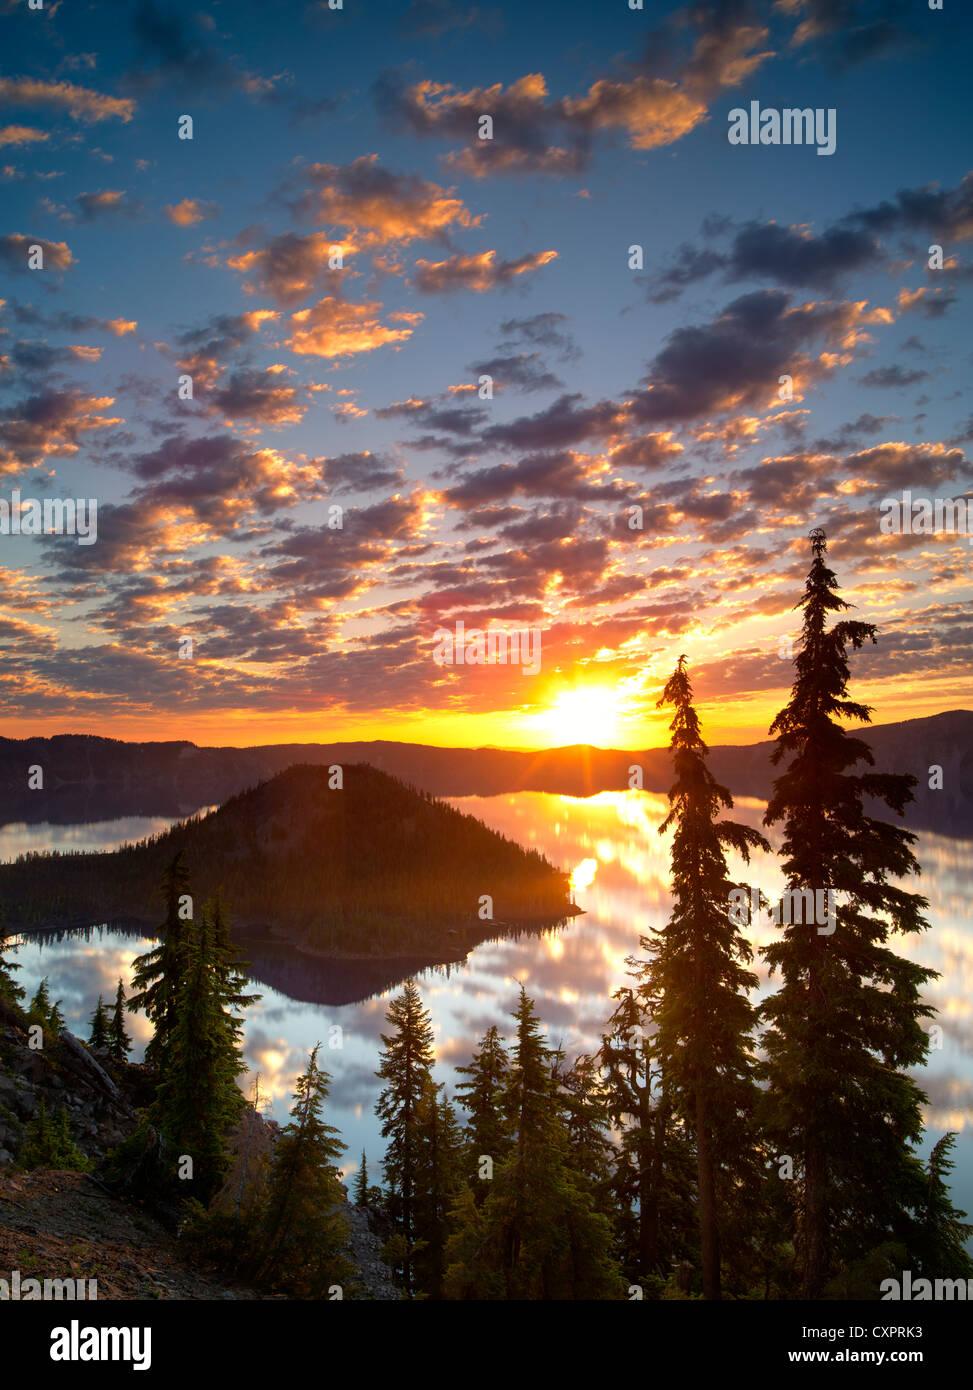 Sonnenaufgang am Kratersee mit Wizard Island. Crater Lake Nationalpark. Silhouette, Oregon Reflexion, Sonne, Wald, Stockbild